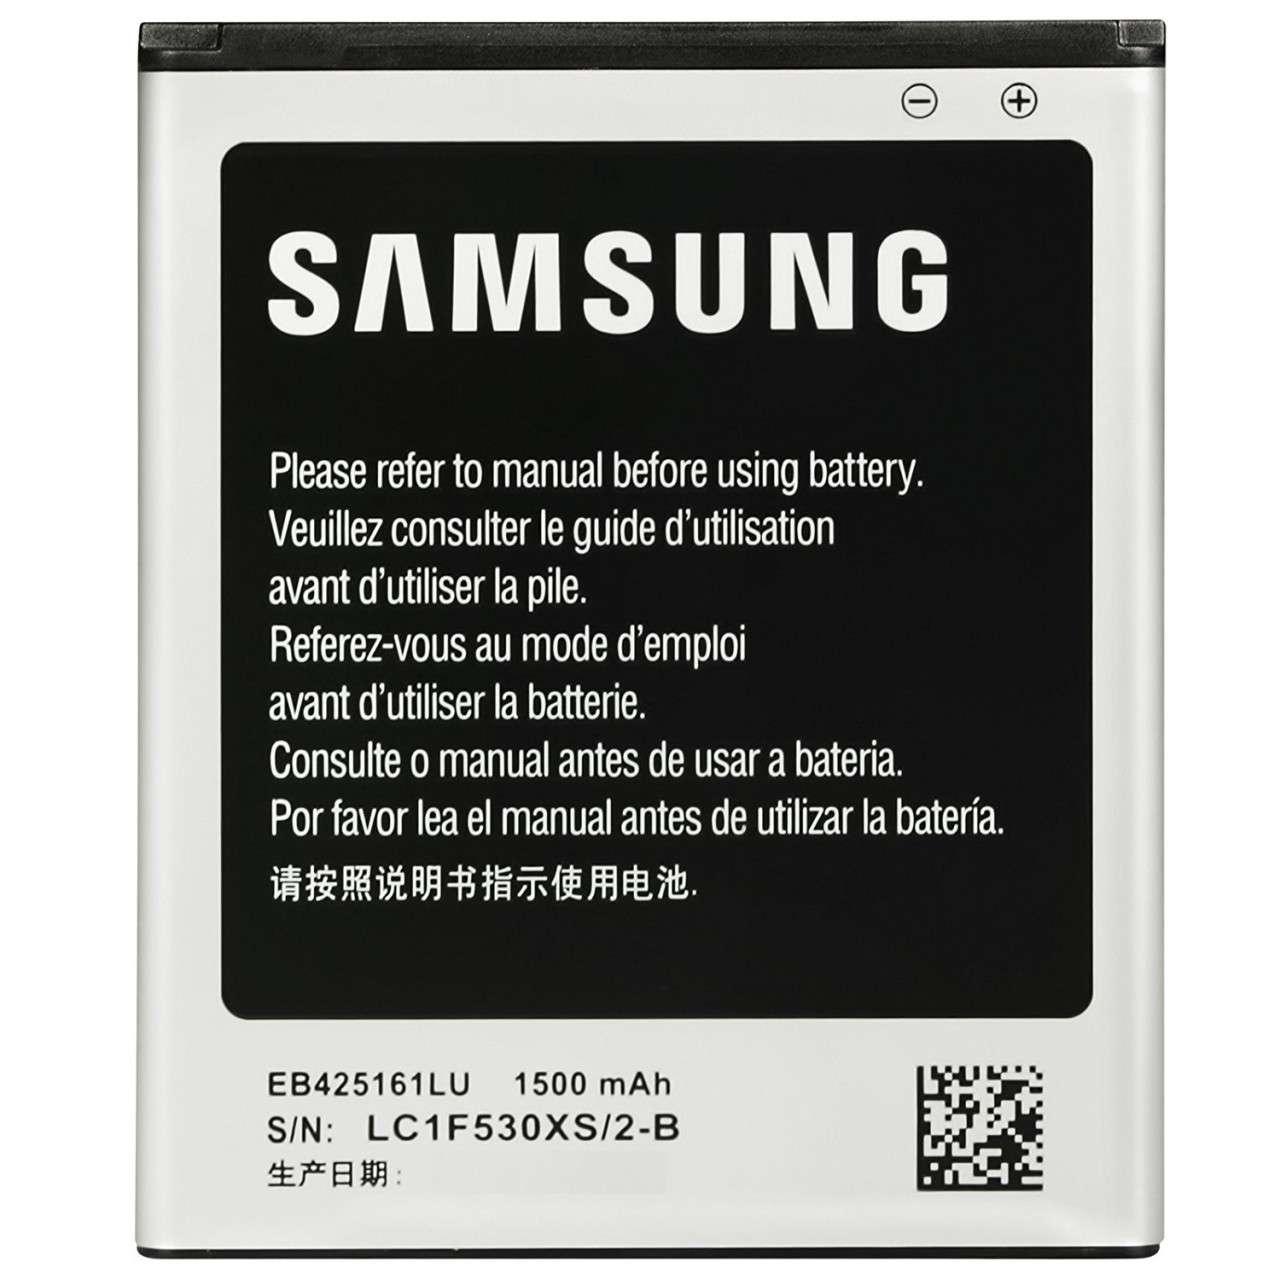 Baterie Acumulator Samsung Galaxy S3 mini VE I8200 imagine 2021